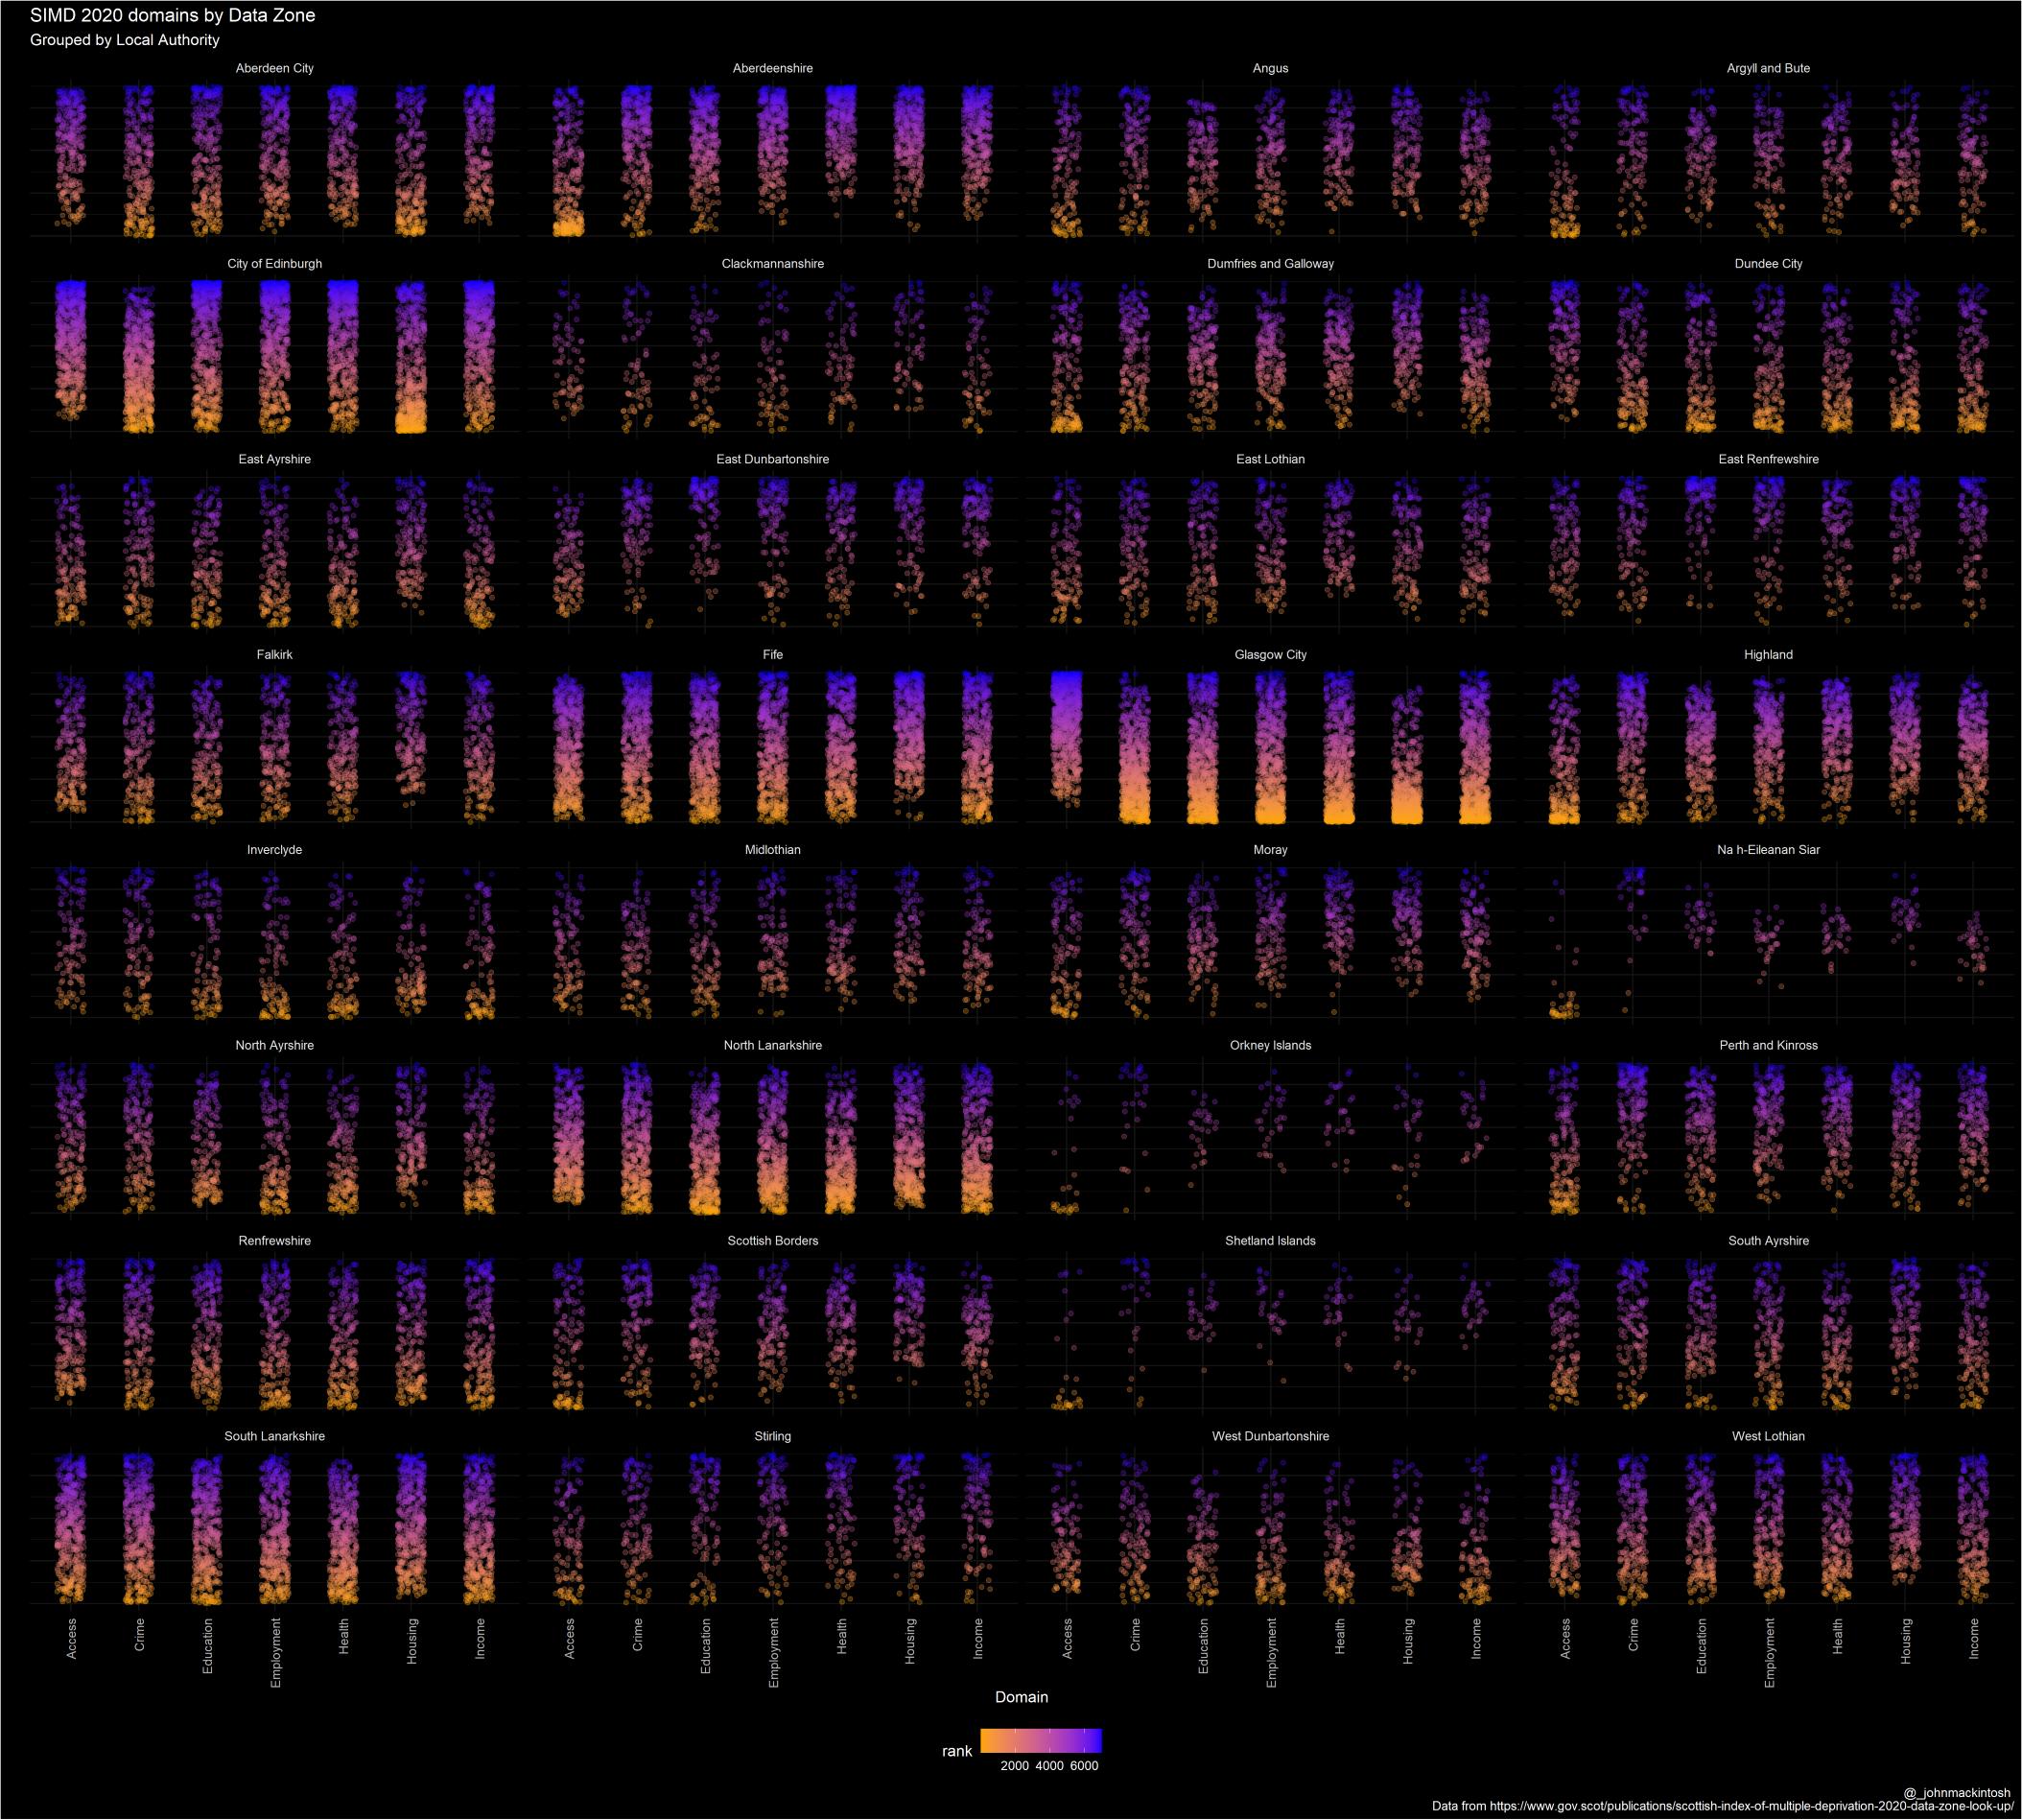 20200717_simd_domain_rank_plot_org_blu.png